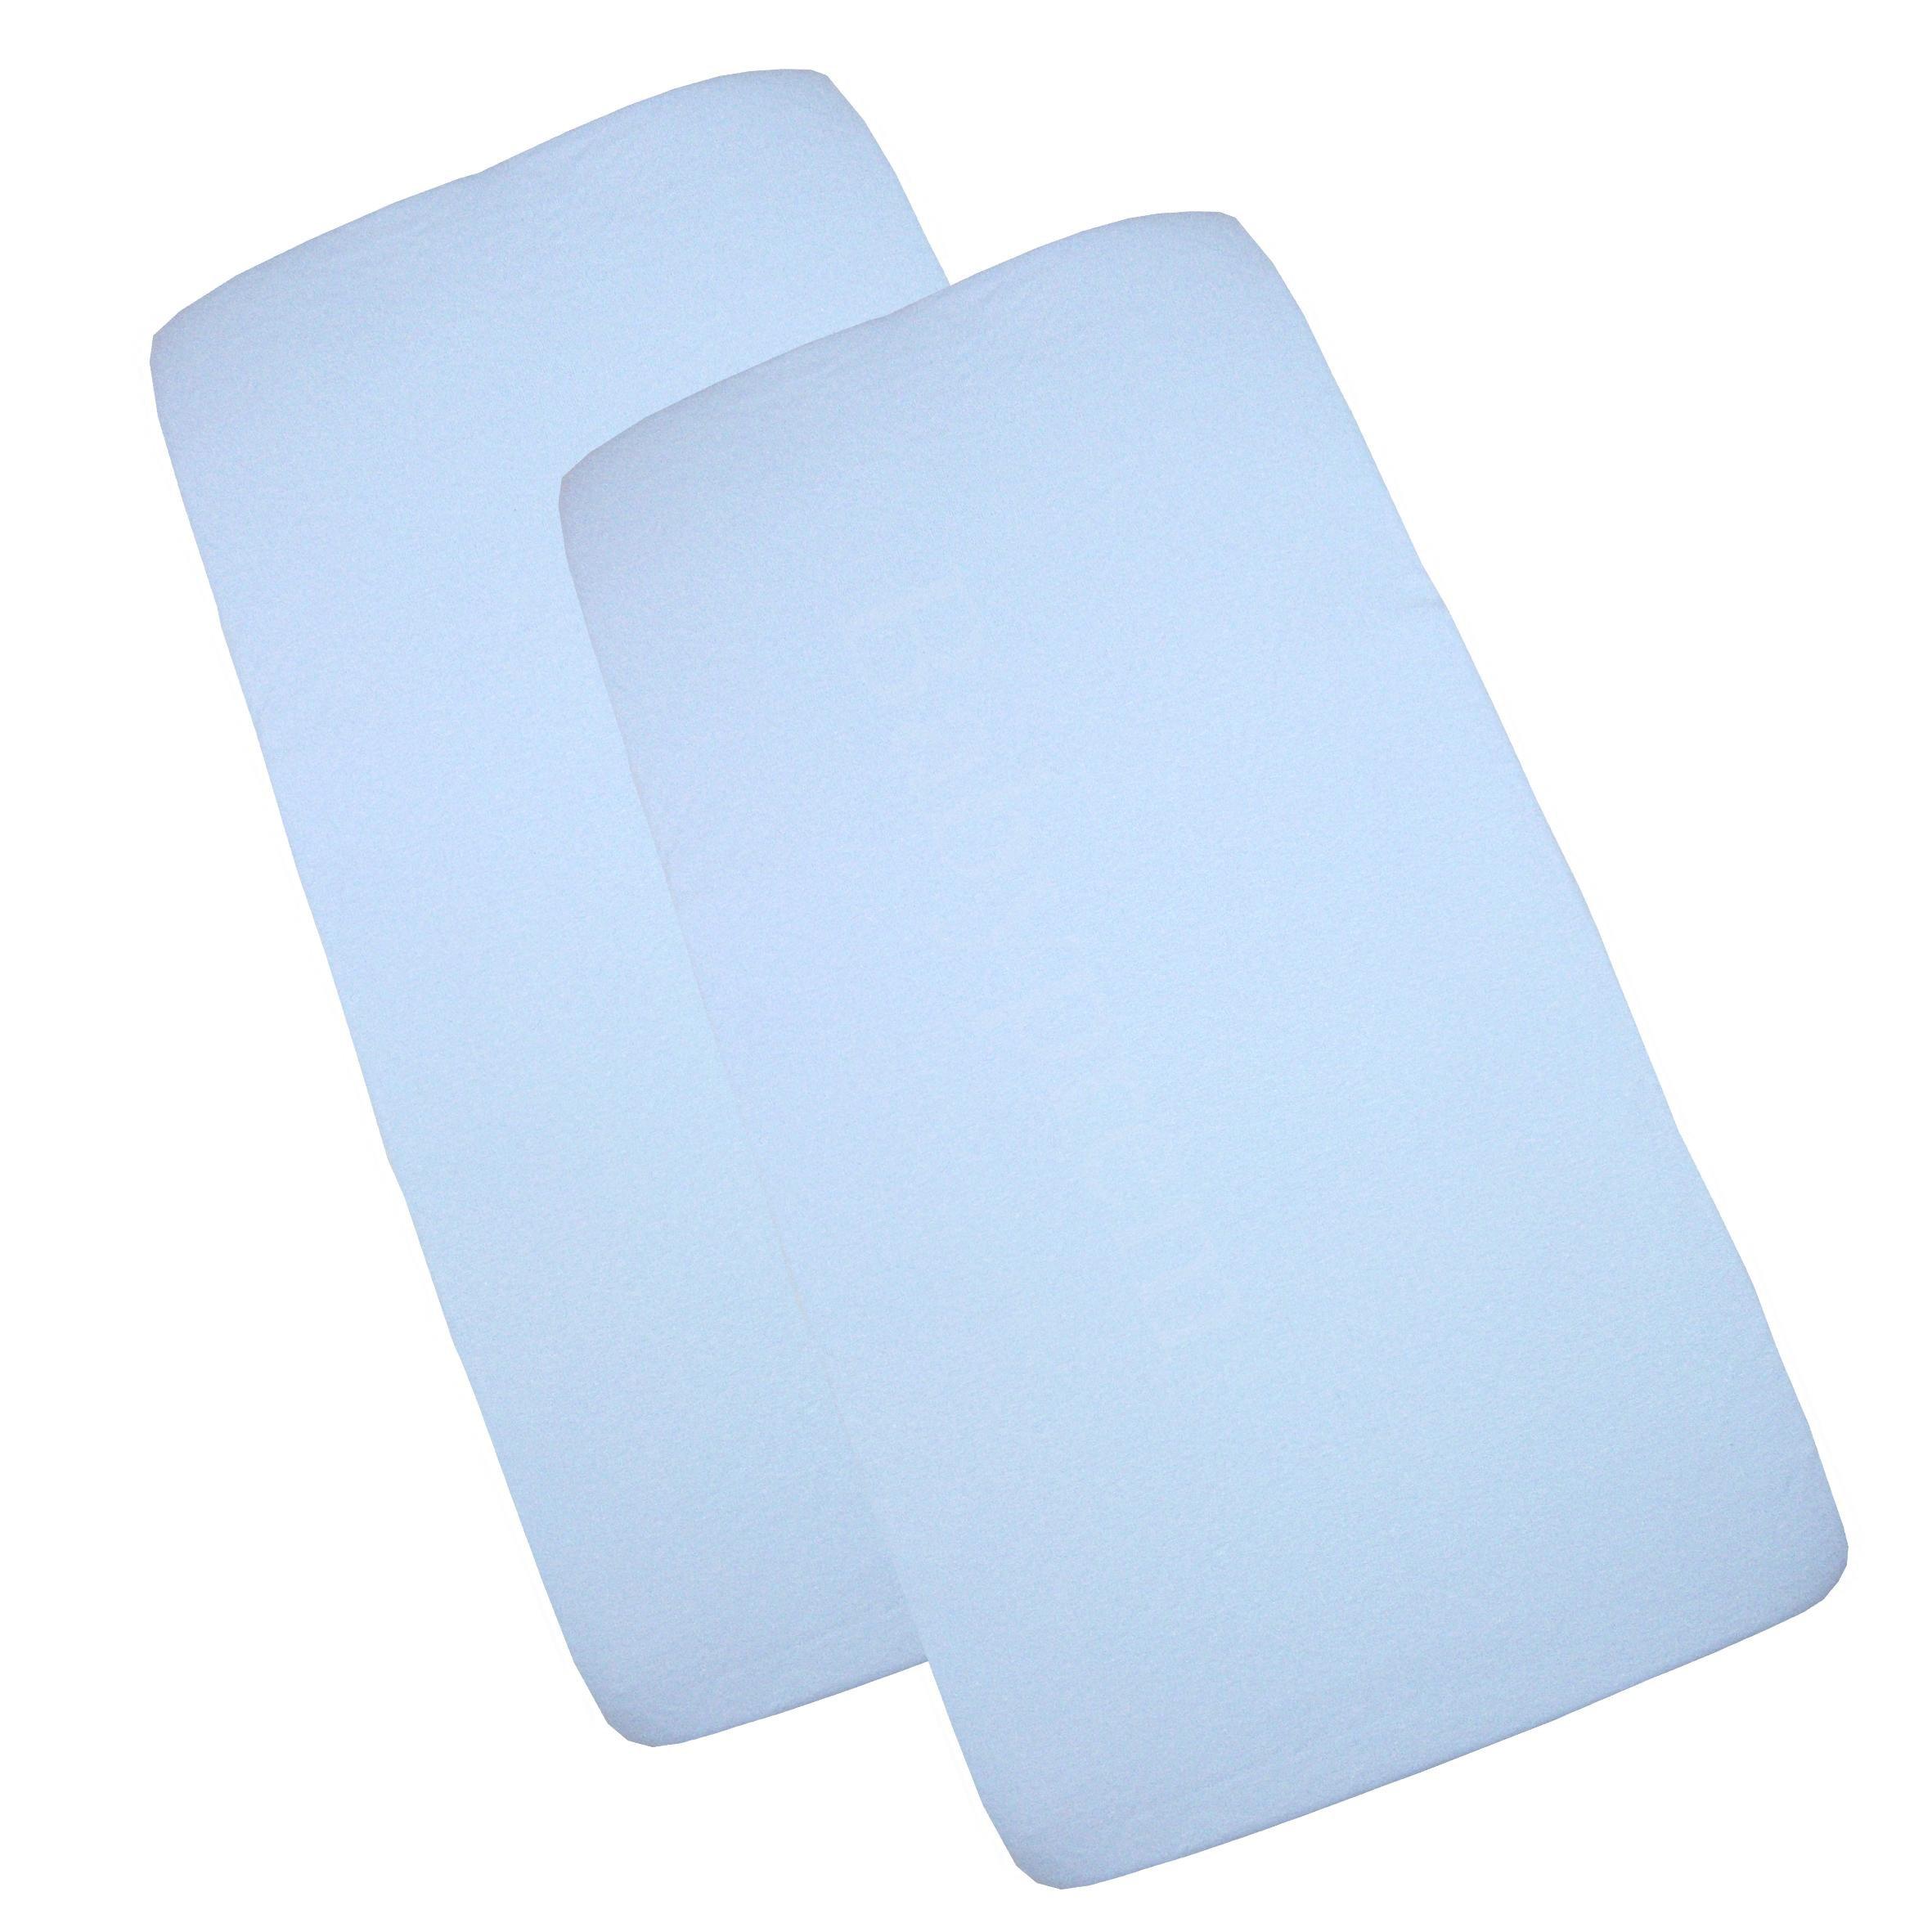 BabyPrem Baby Bedding Fitted Cotton Pram/Cradle Sheets 33 x 17'' Pack of 2 Blue by BabyPrem